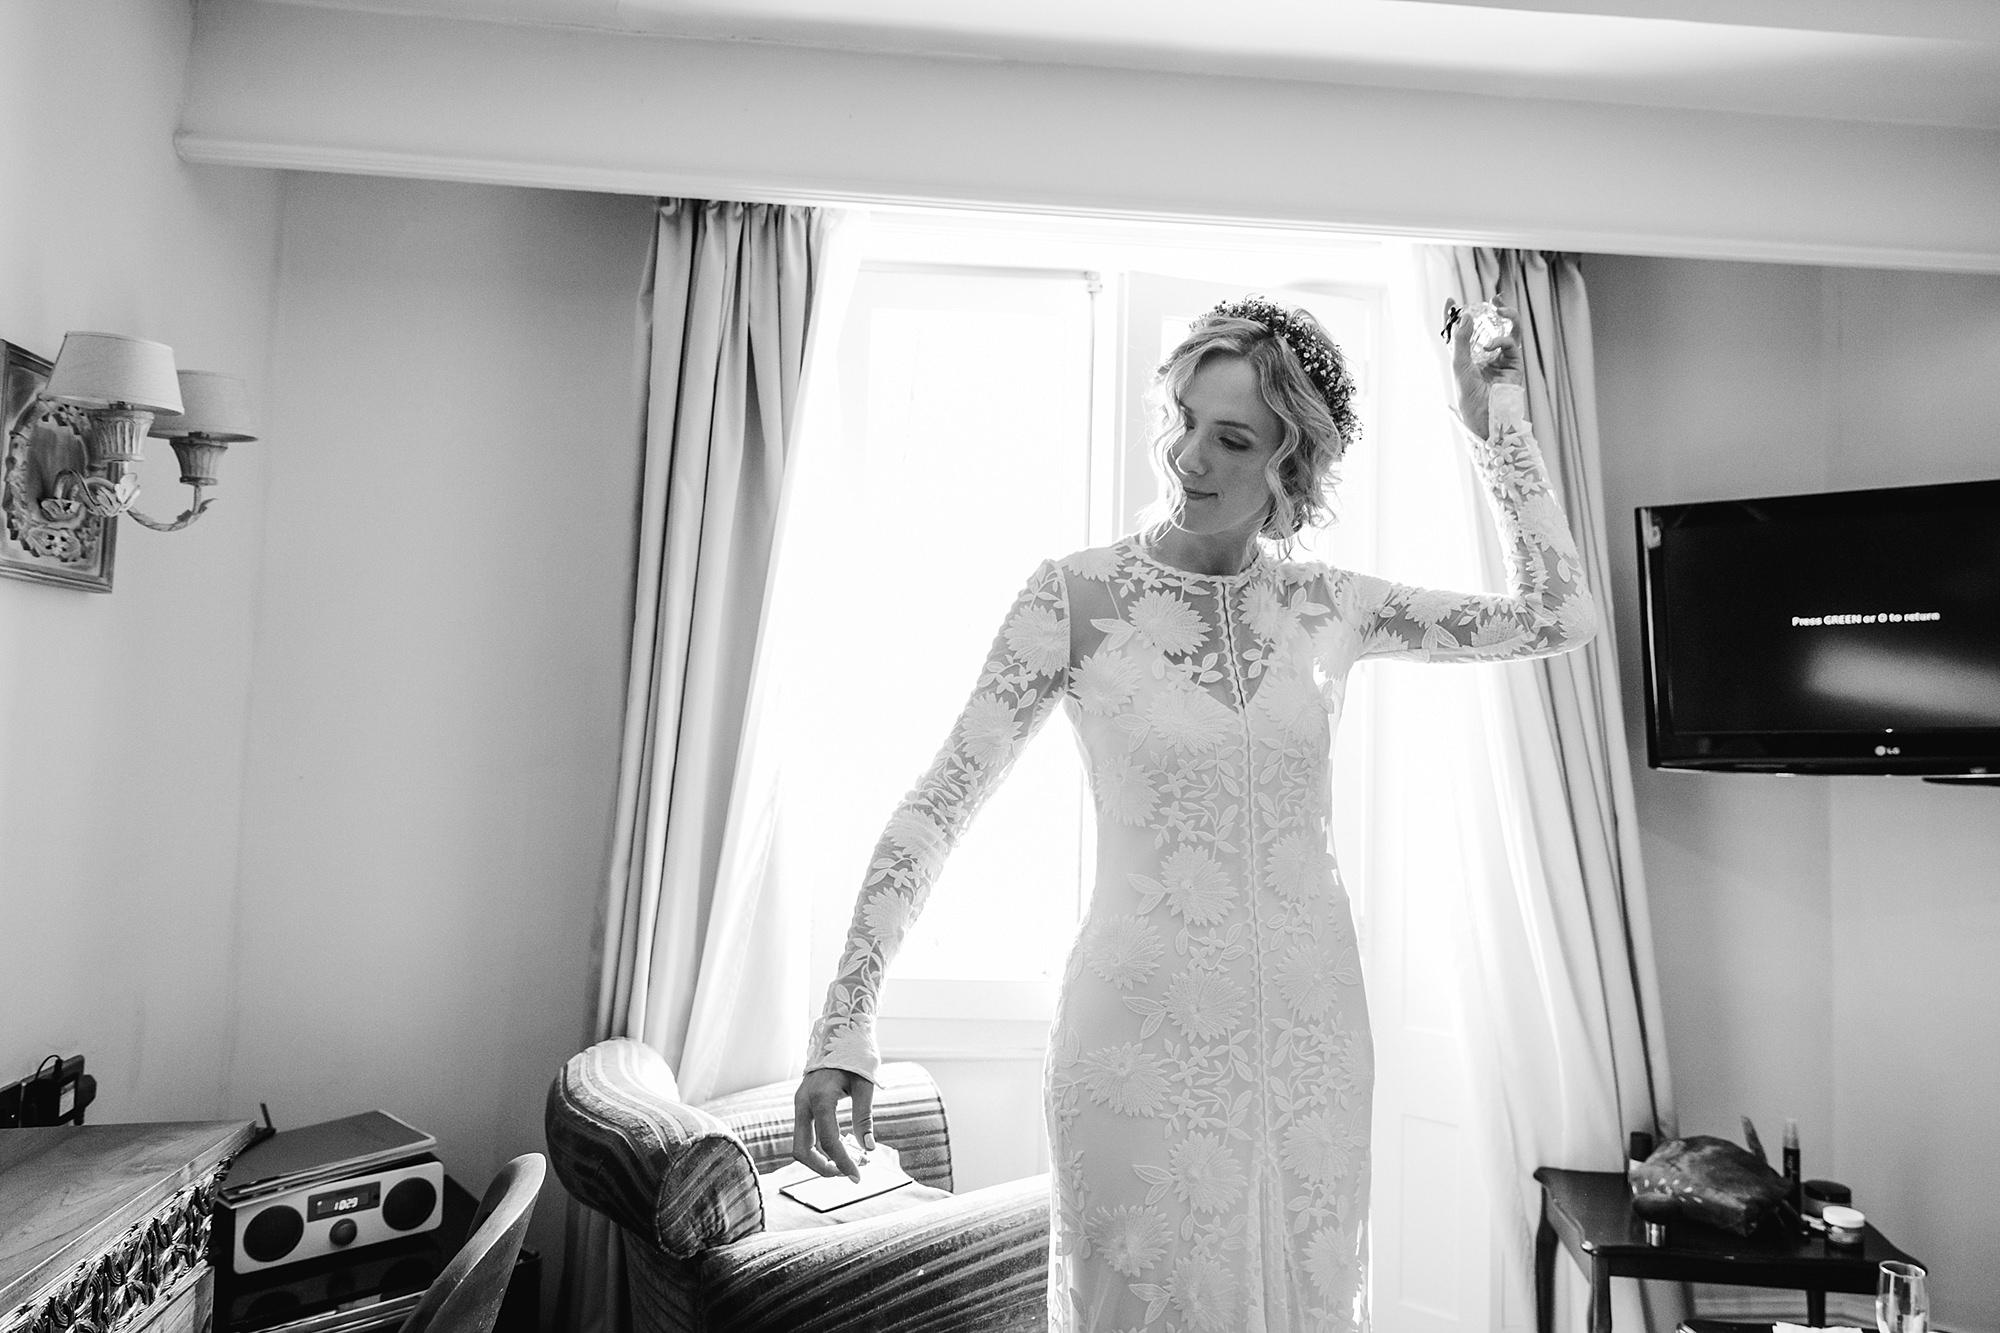 Isis Farmhouse Oxford Wedding portrait of bride spraying perfume as she gets ready